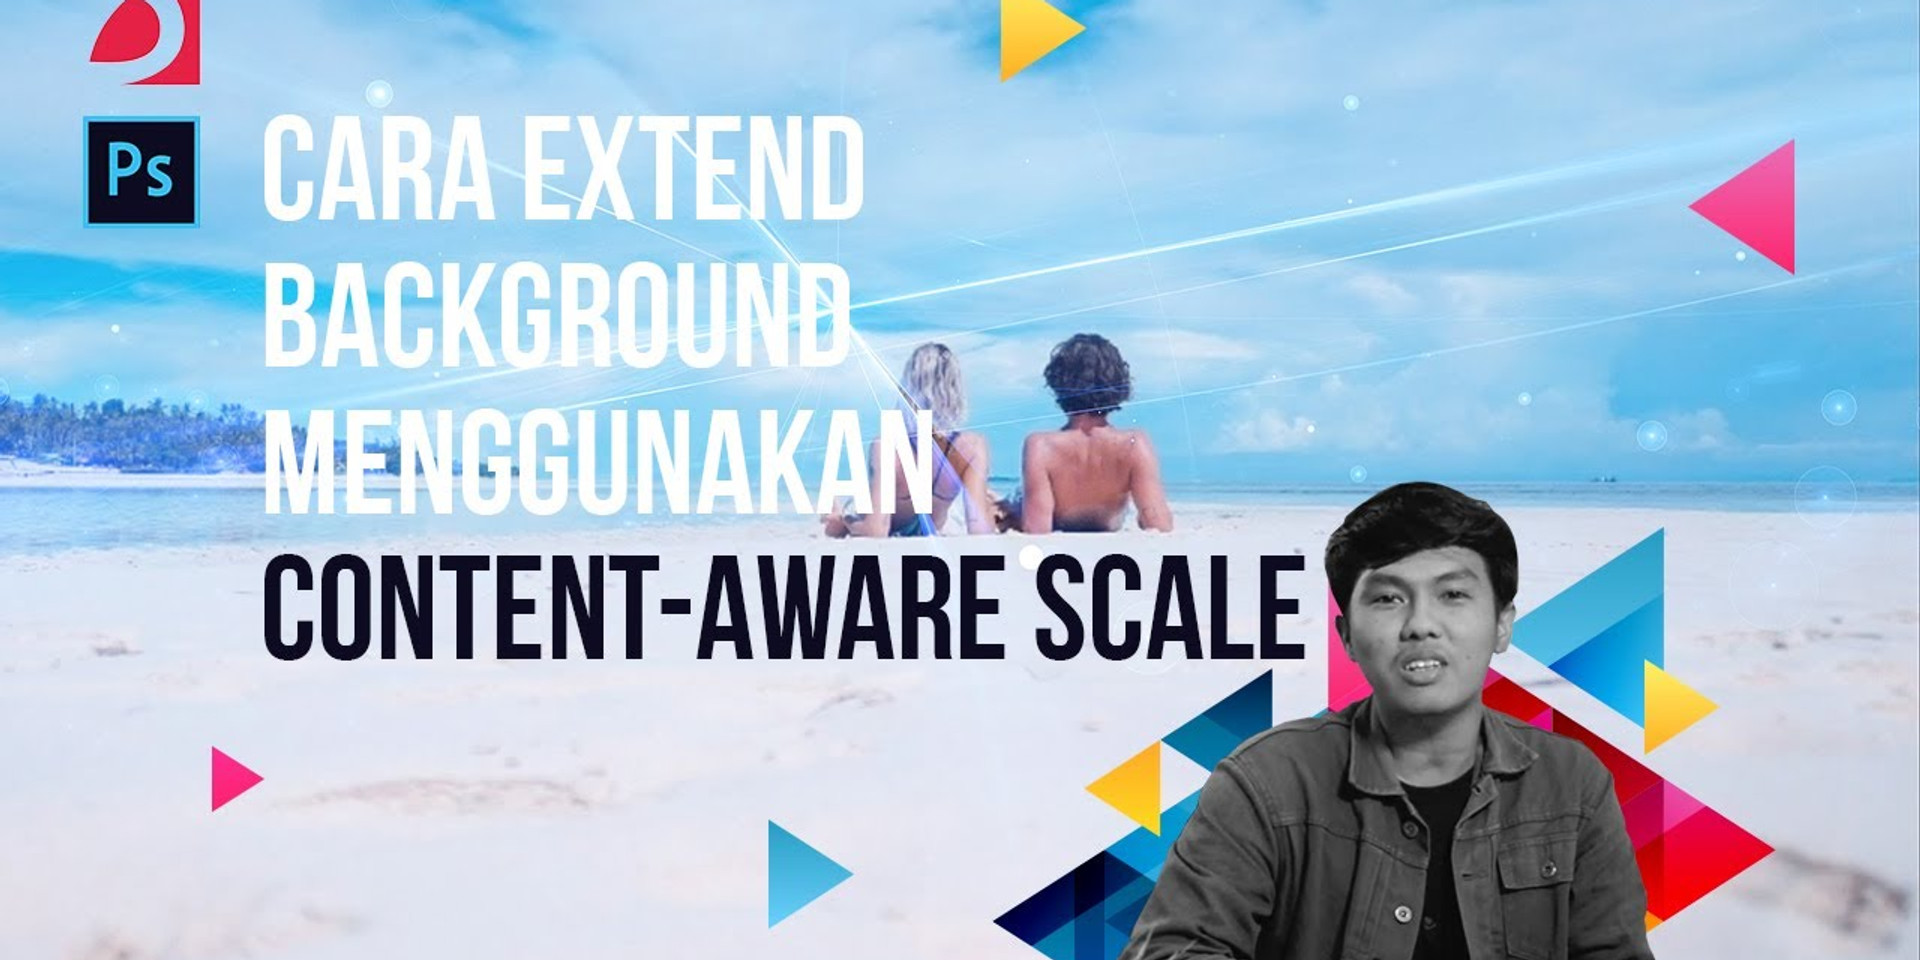 Tutorial Photoshop: Cara Extend Background Menggunakan Content-Aware Scale (Indonesia)